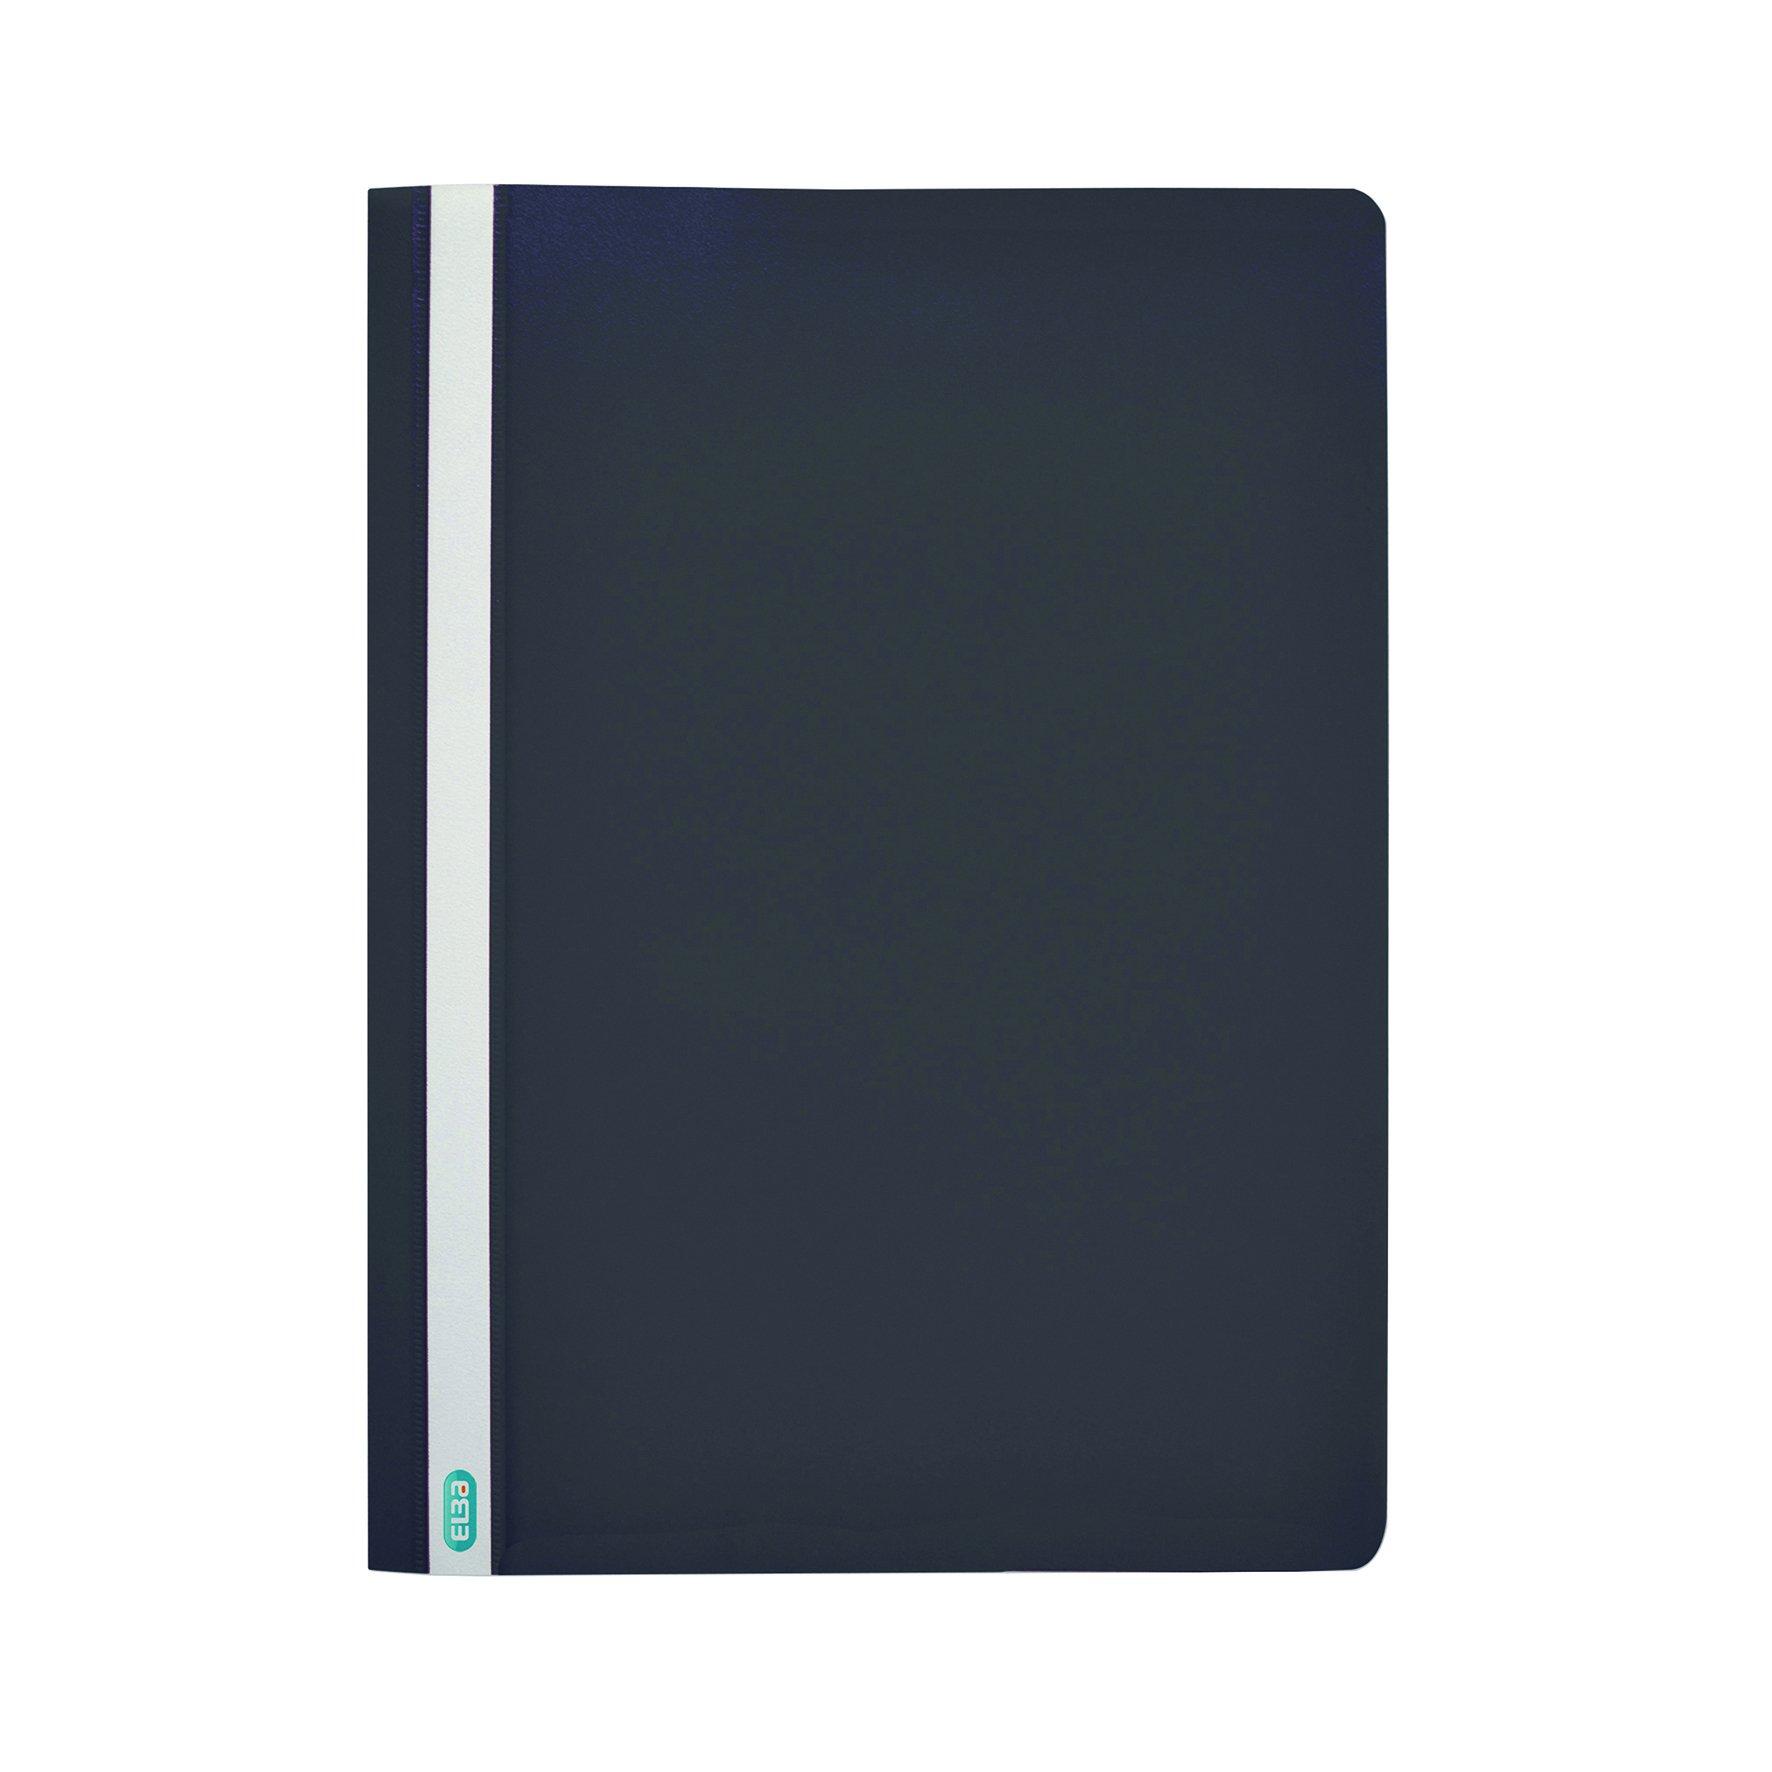 Elba Report Folder A4 Black 400055033